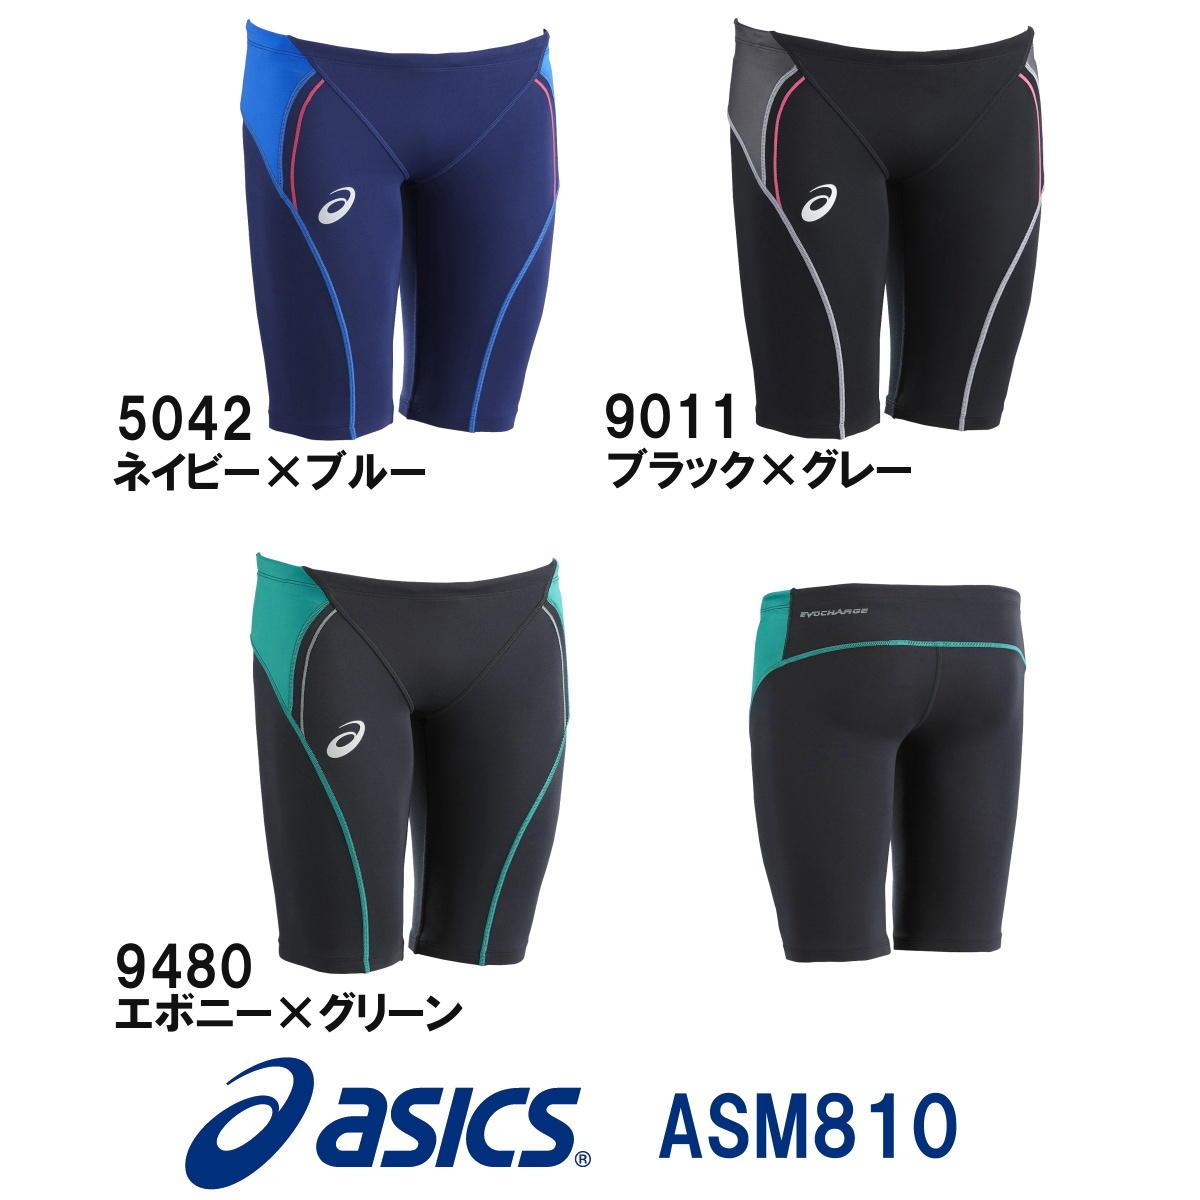 【ASM810】asics(アシックス)メンズ競泳練習水着REPEATEX2EVOCHARGEスパッツ[男性用/練習用/スパッツ]